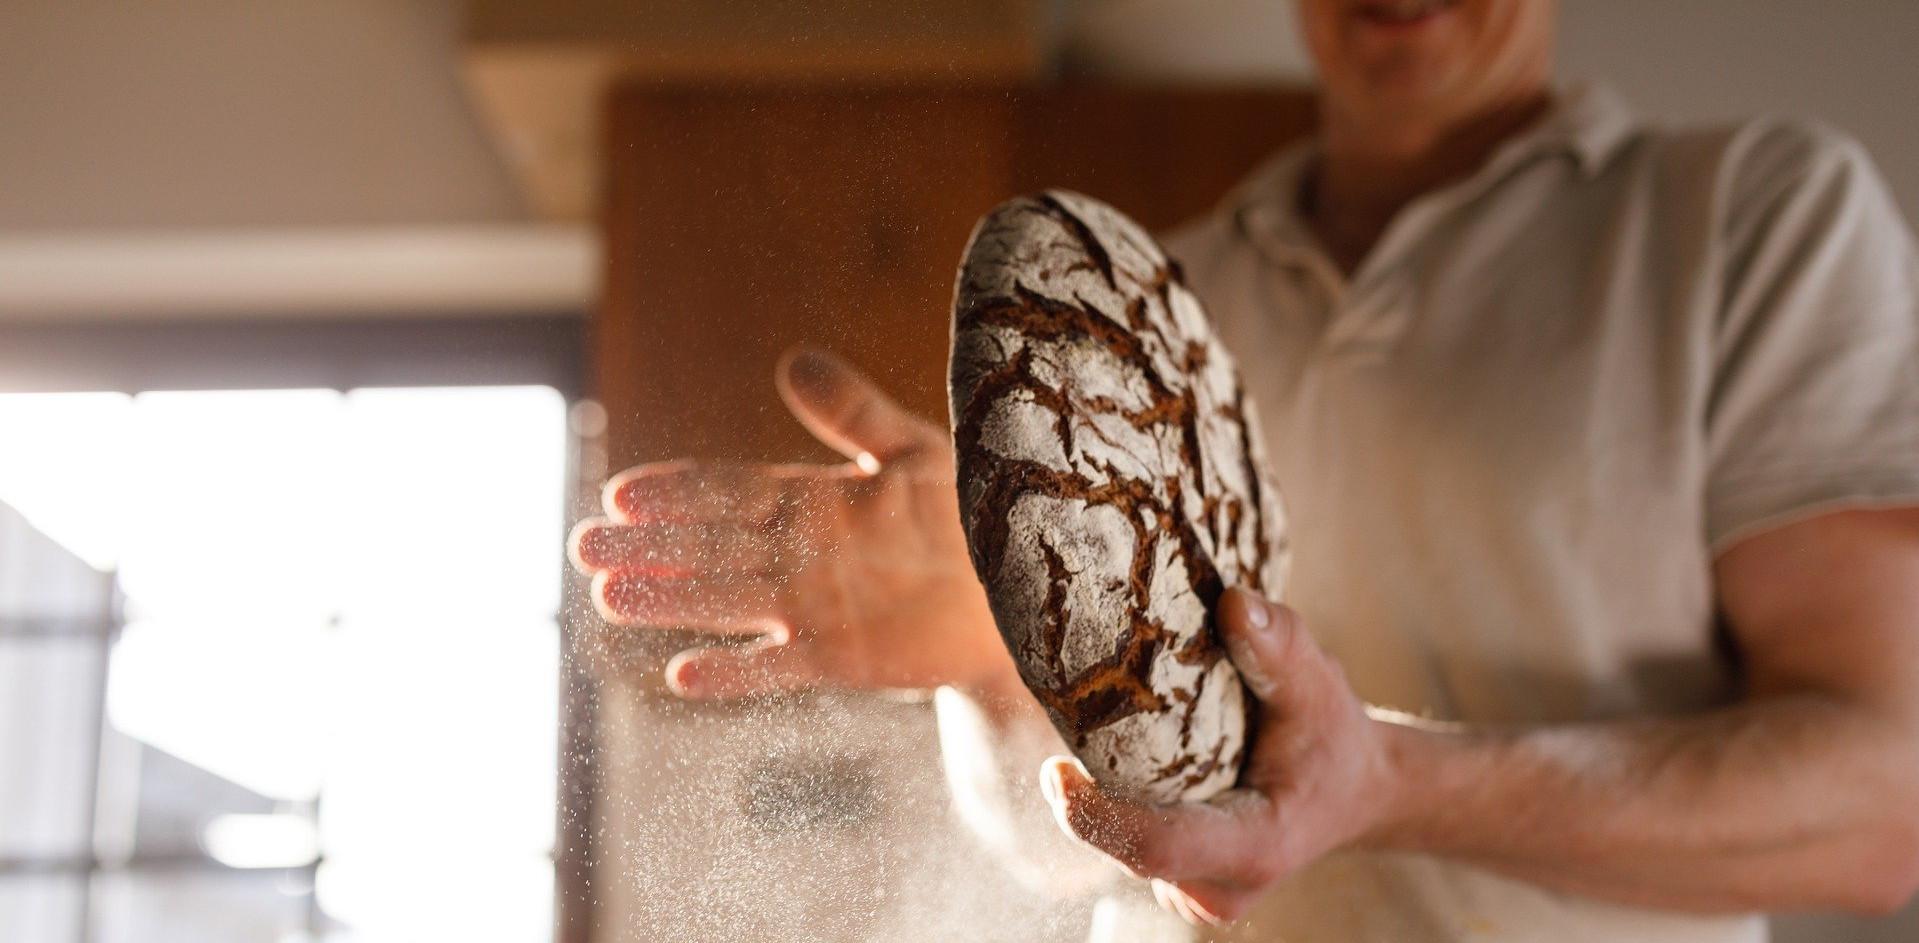 Online Werbung Bäcker